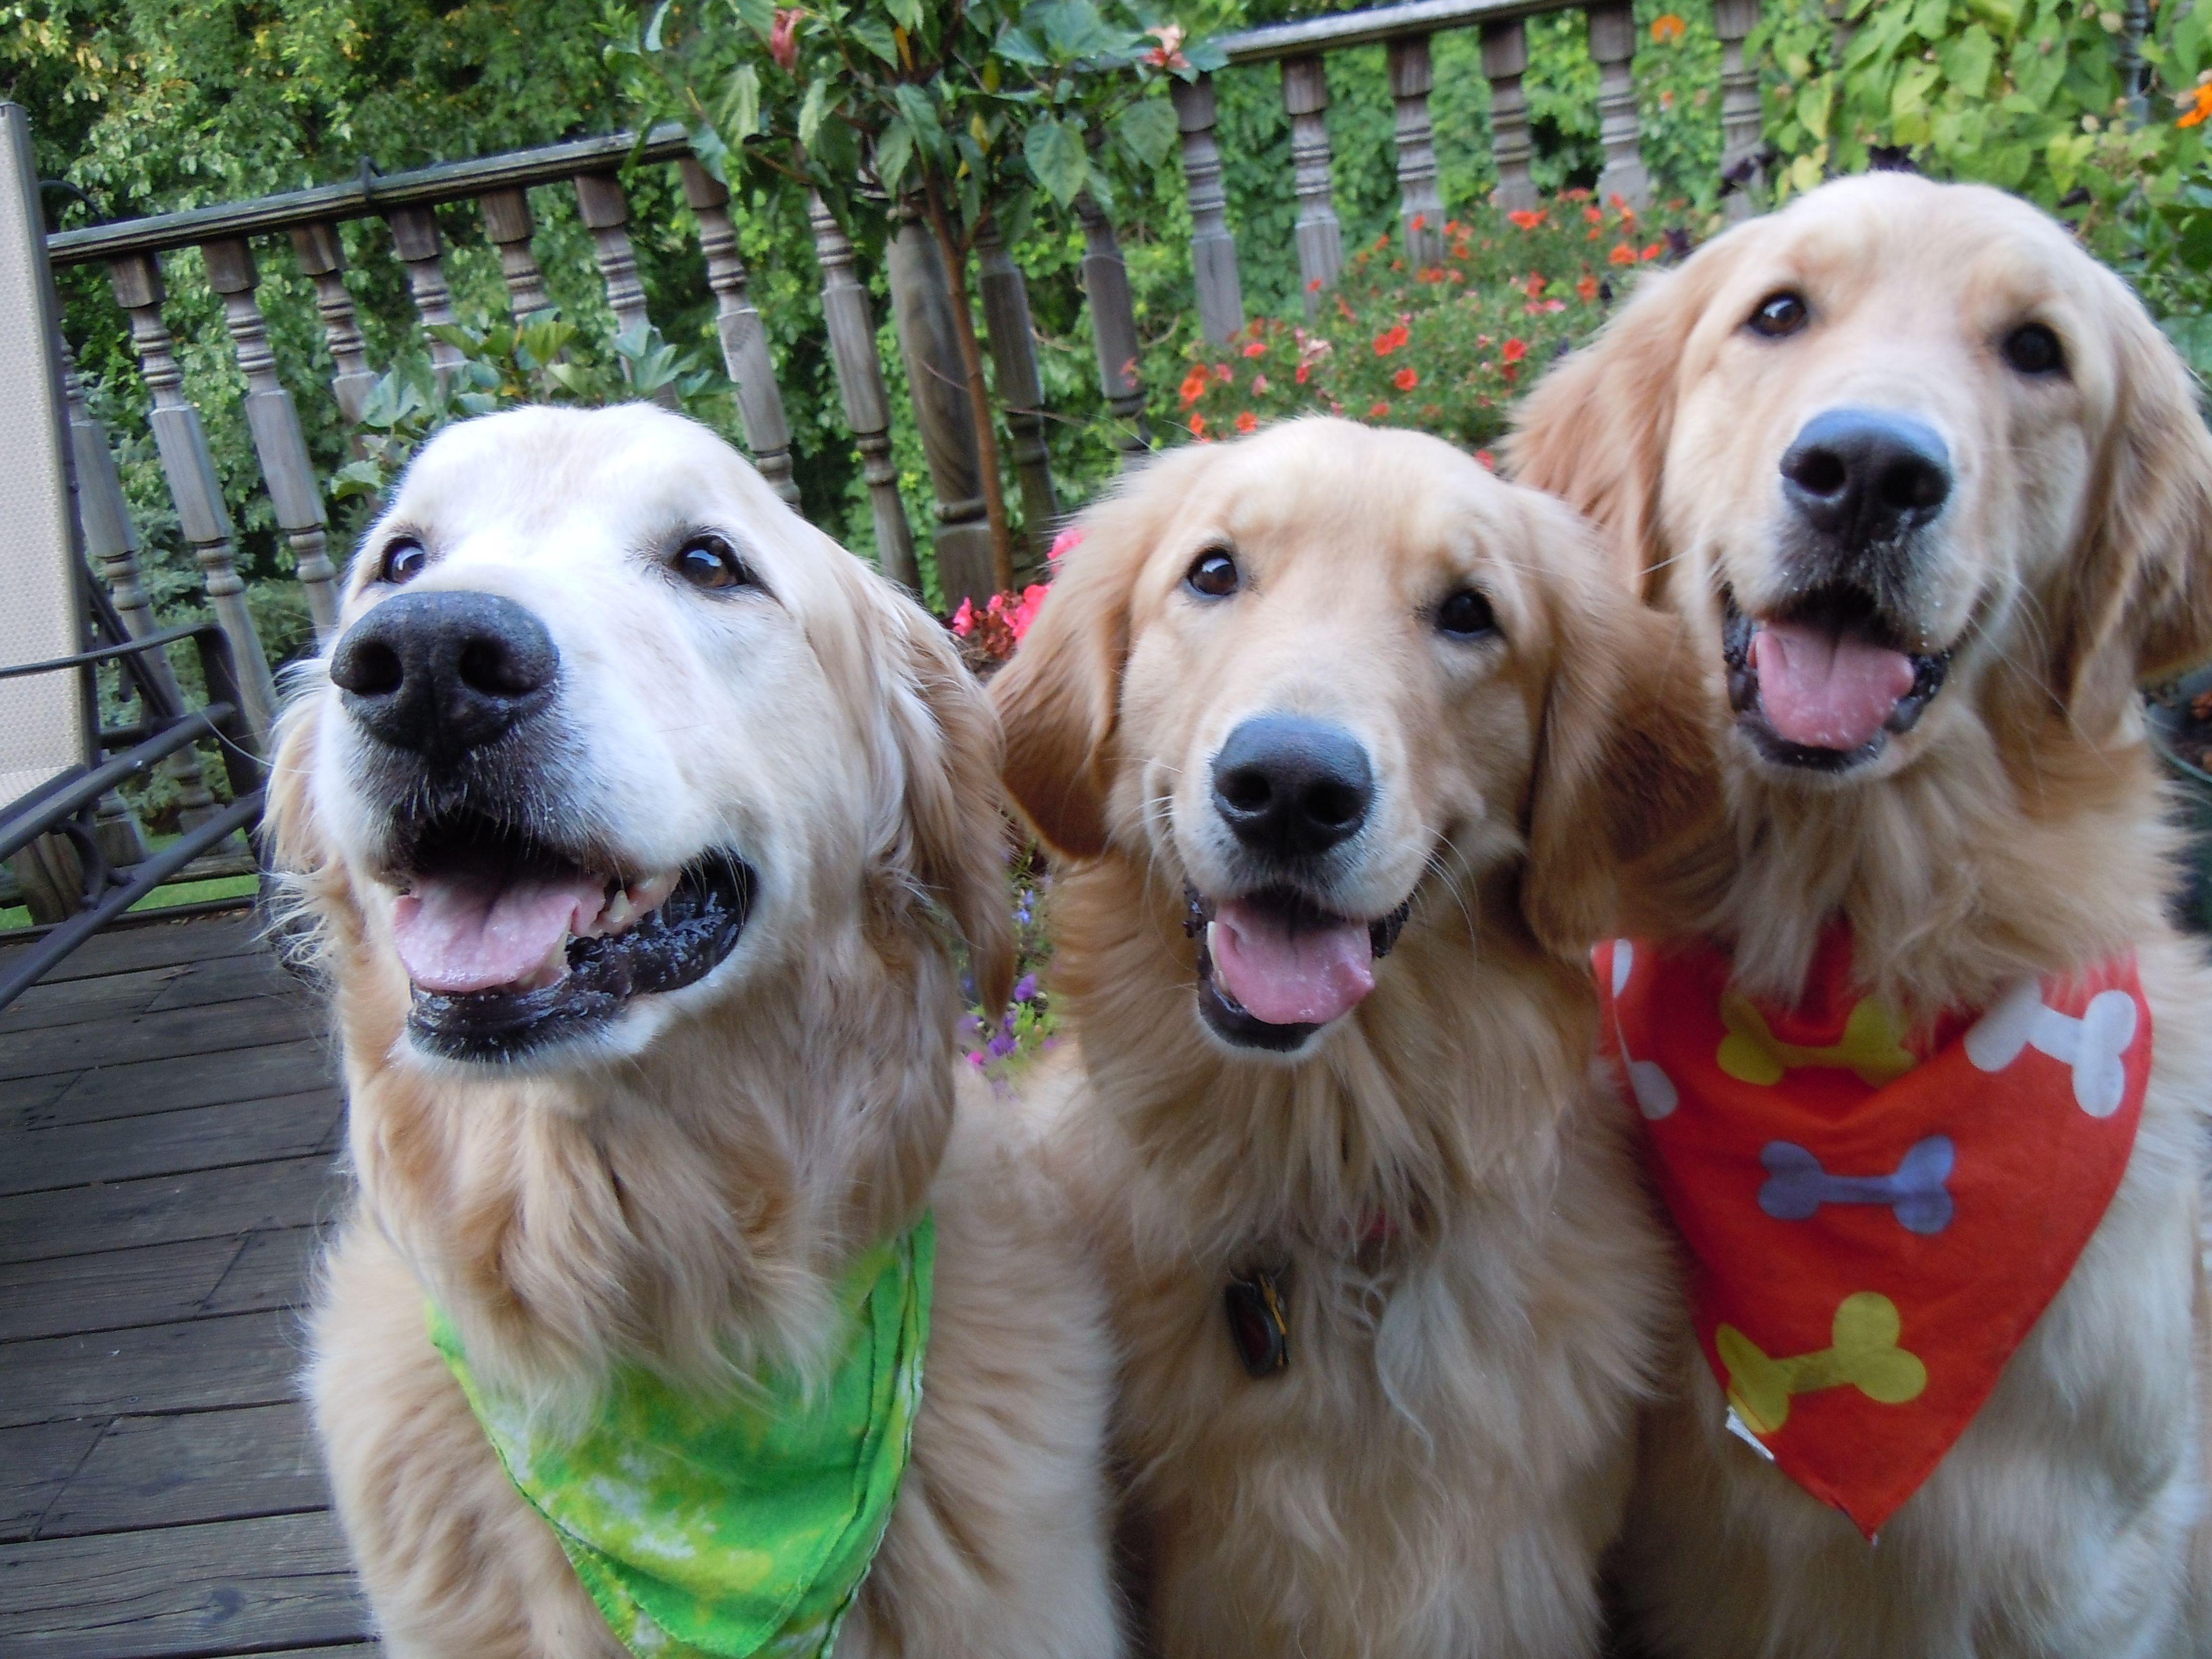 3 amigos golden retriever dog life cute animals